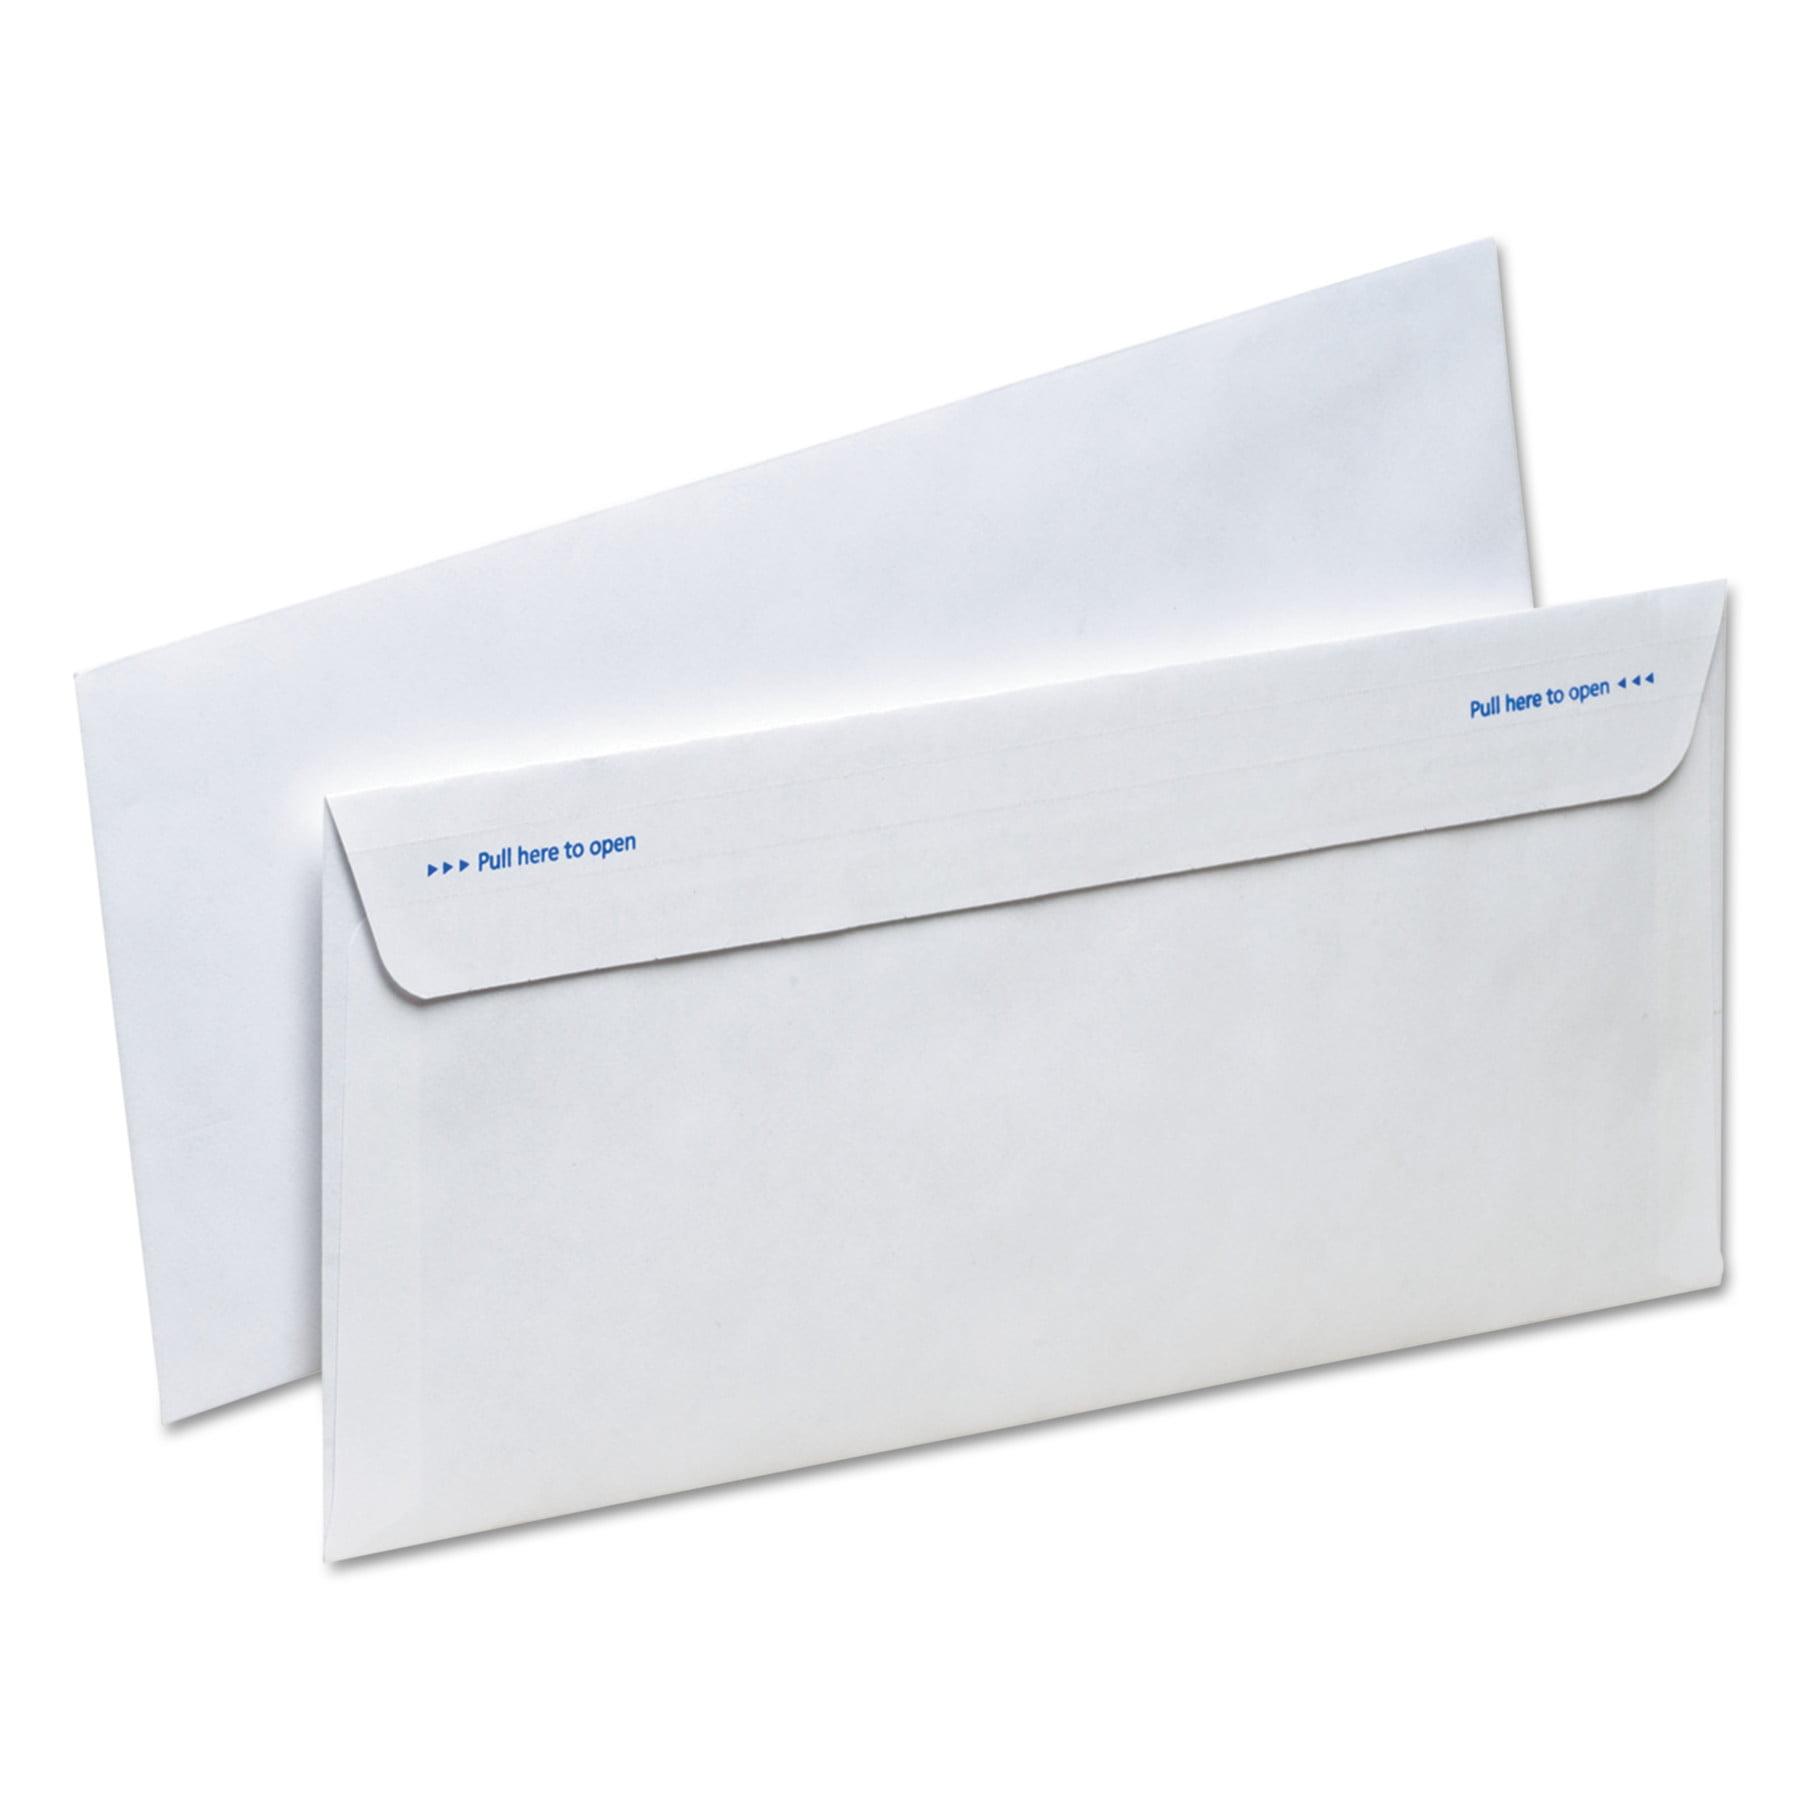 Ampad Gold Fibre Fastrip Release & Seal Envelope, #10, 4 1/8 x 9 1/2, White, 100/Box